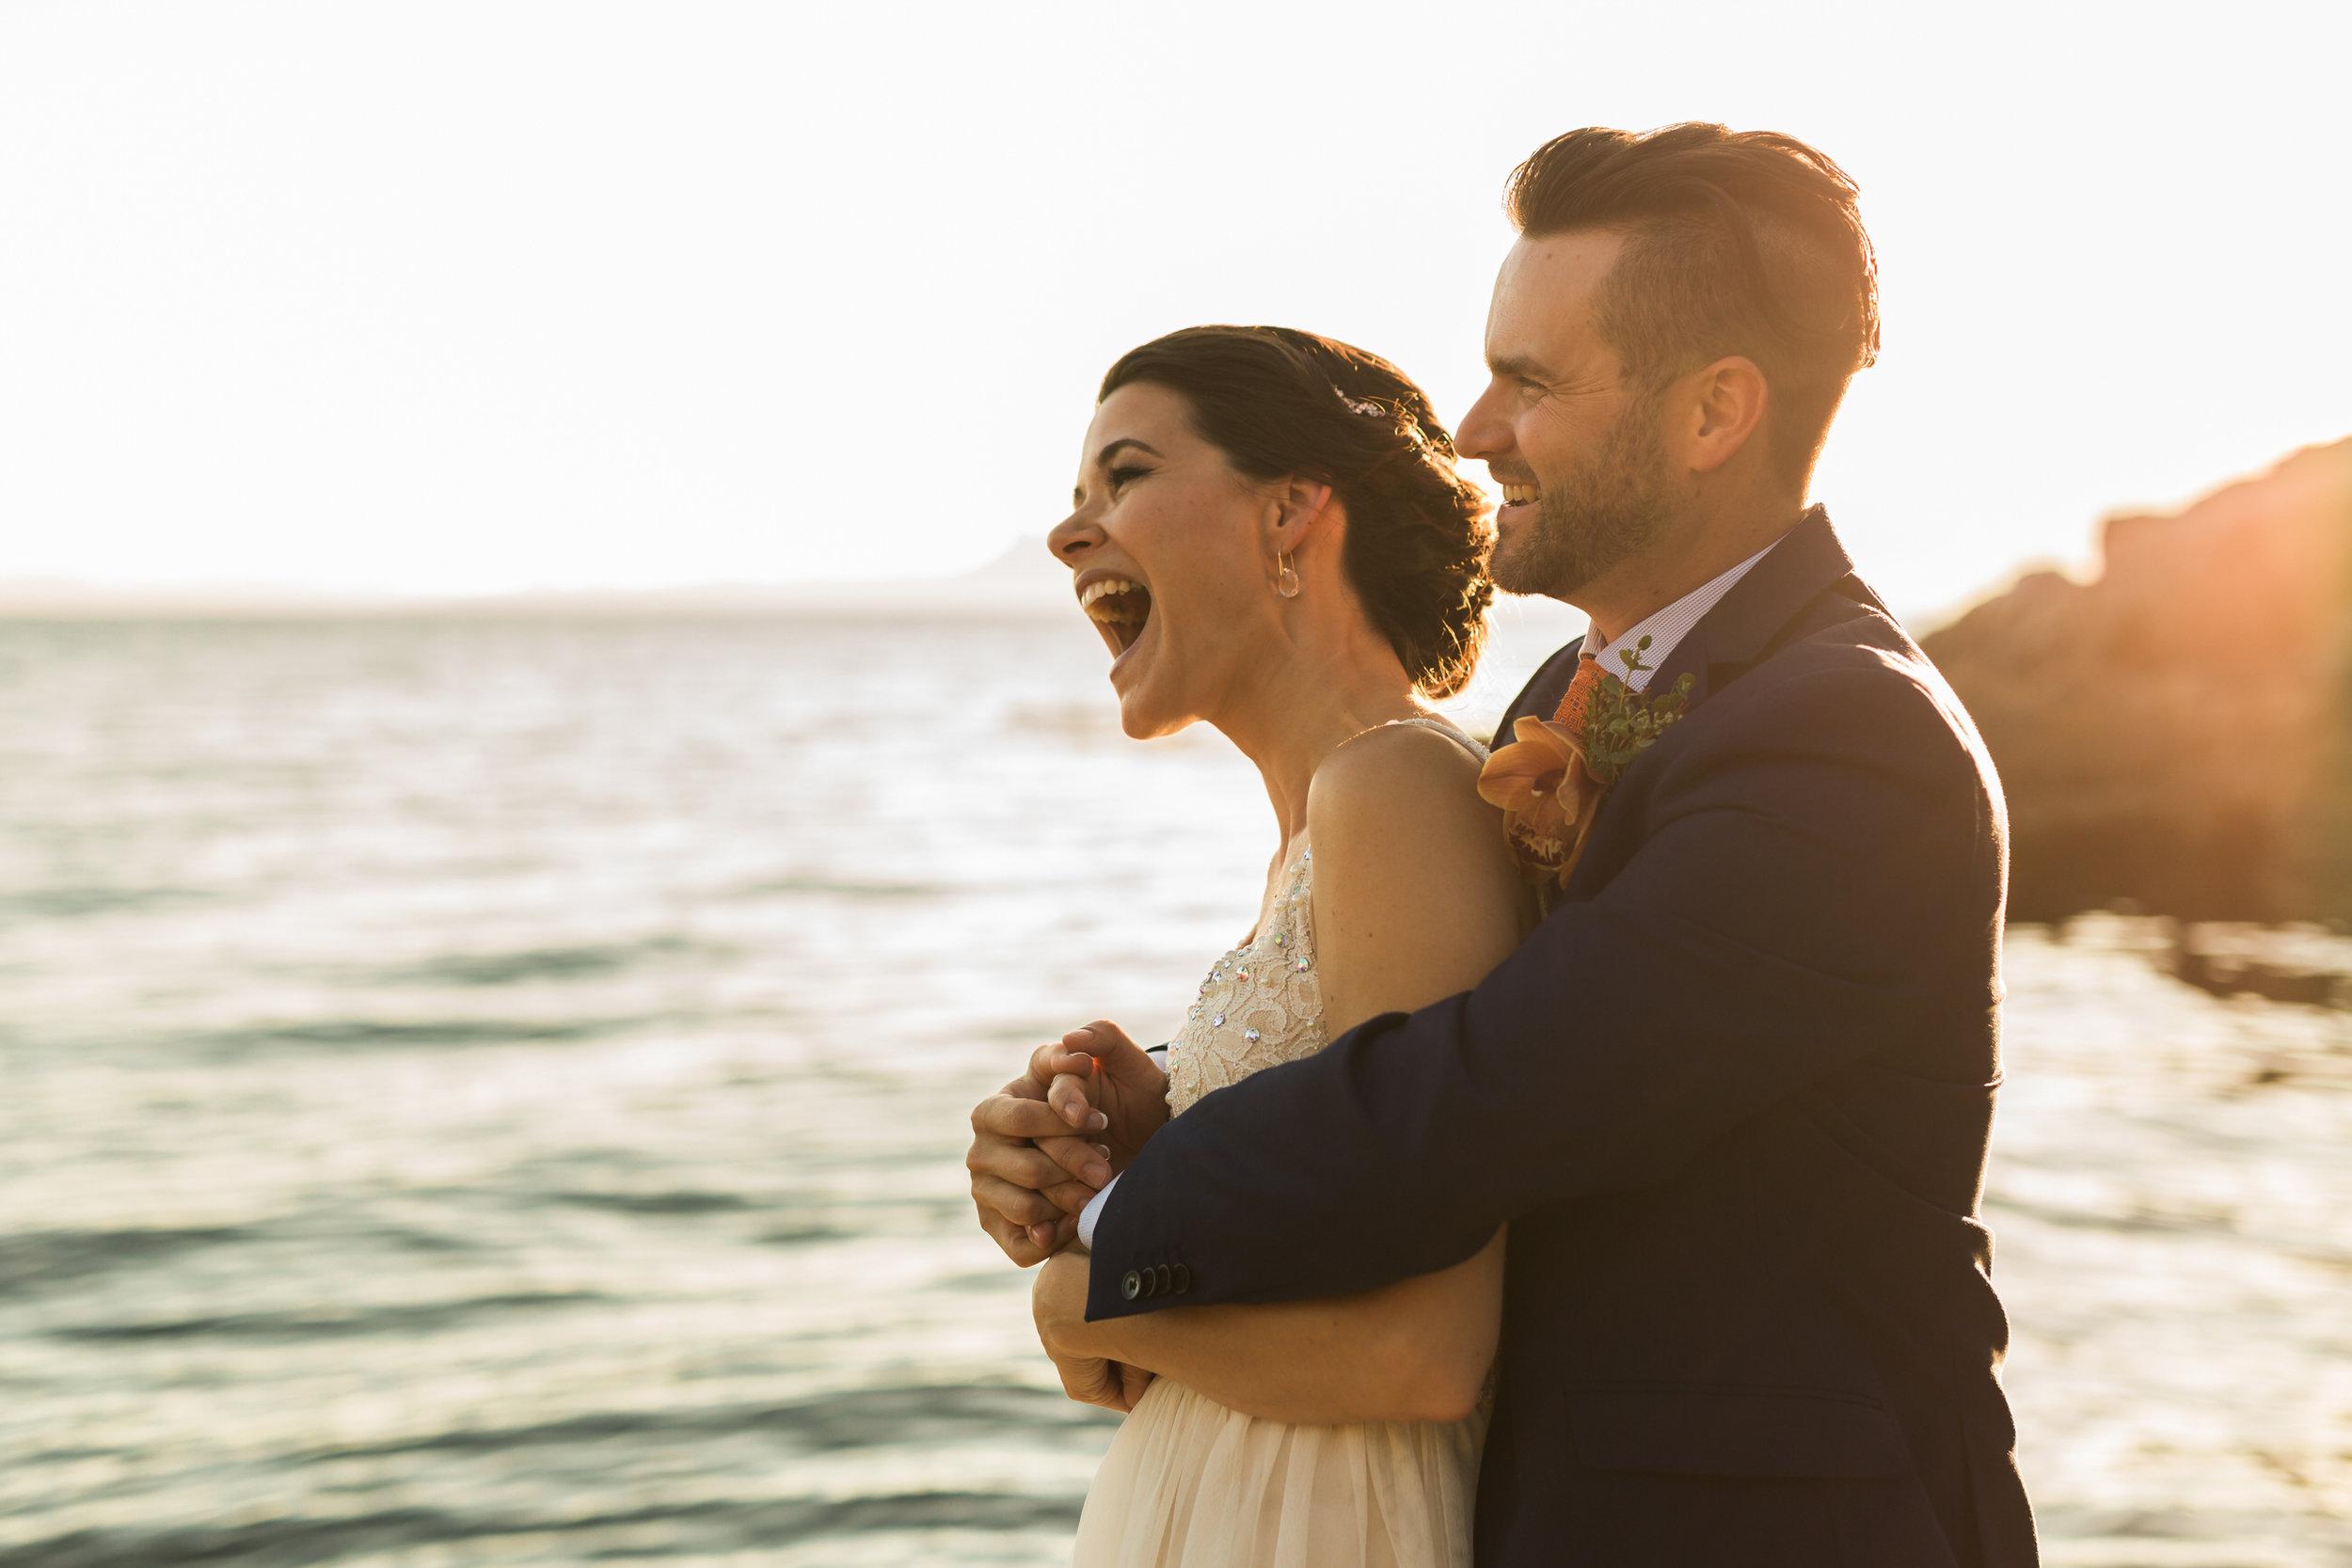 Rockwater Secret Cove Resort Wedding - Sunshine Coast BC Wedding Photographer - Vancouver Wedding Photographer - Sunshine Coast Elopement Photos - IMG_1314.jpg